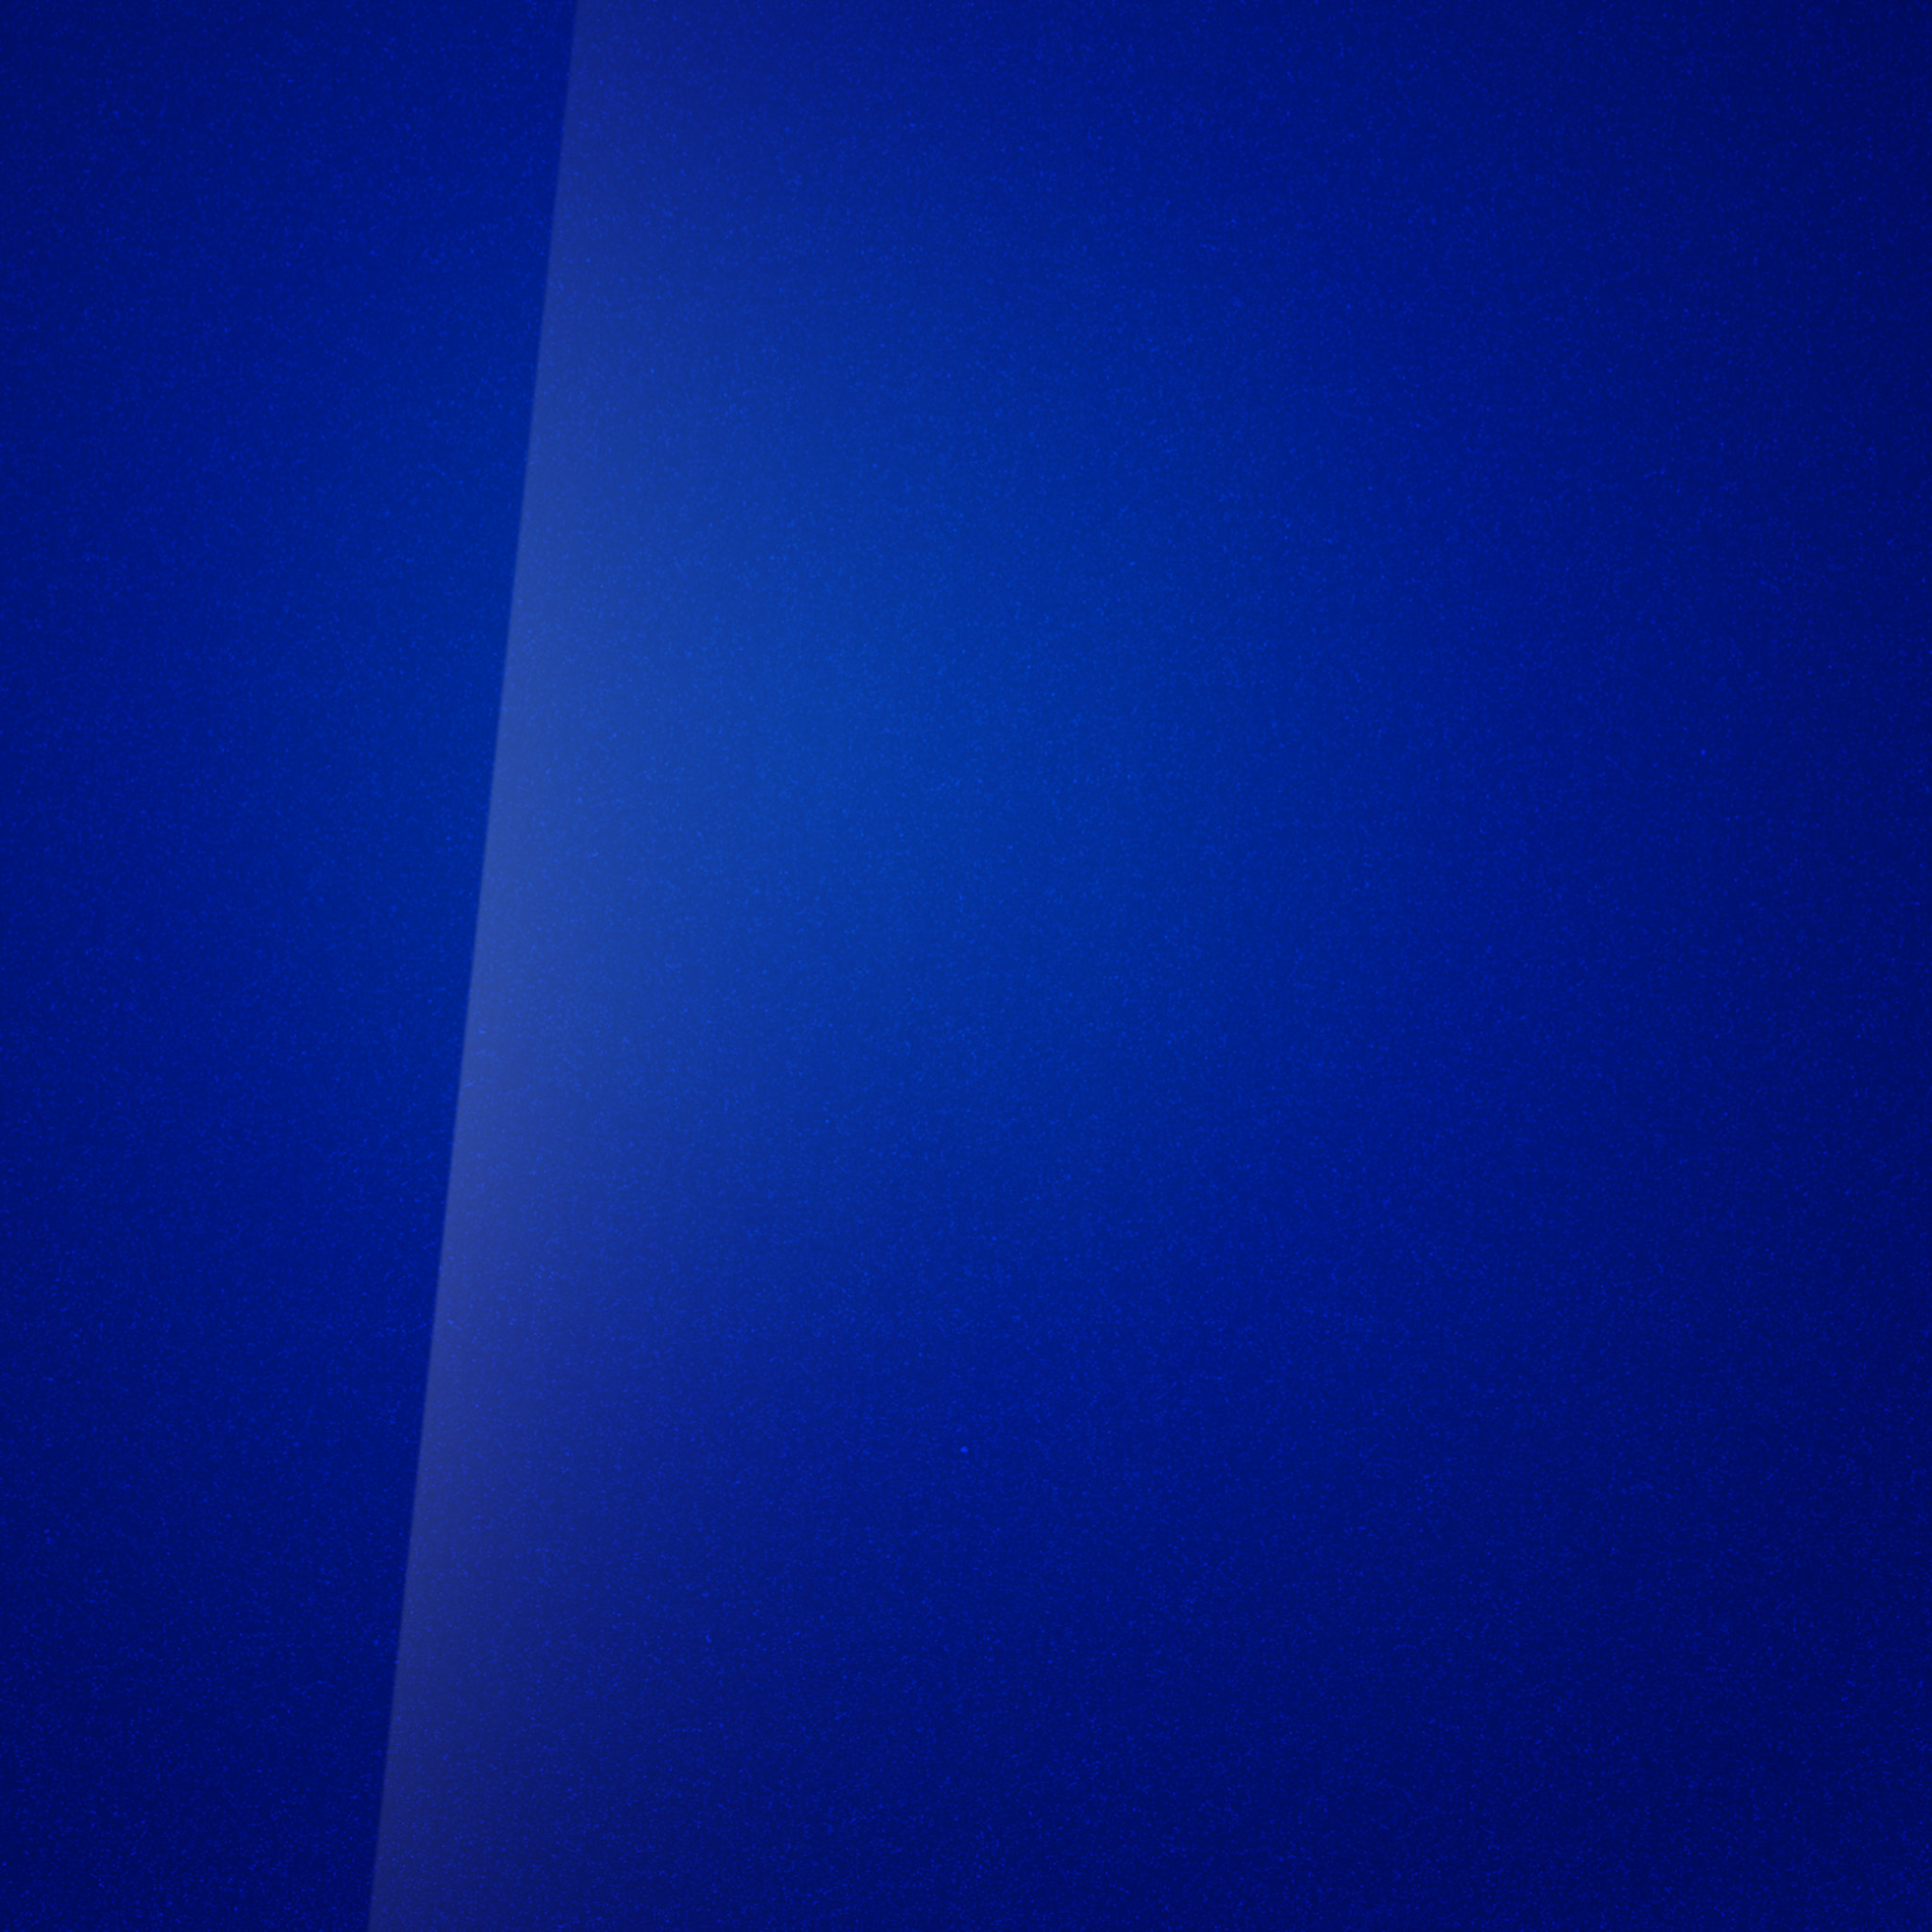 Intense Blue) Bild